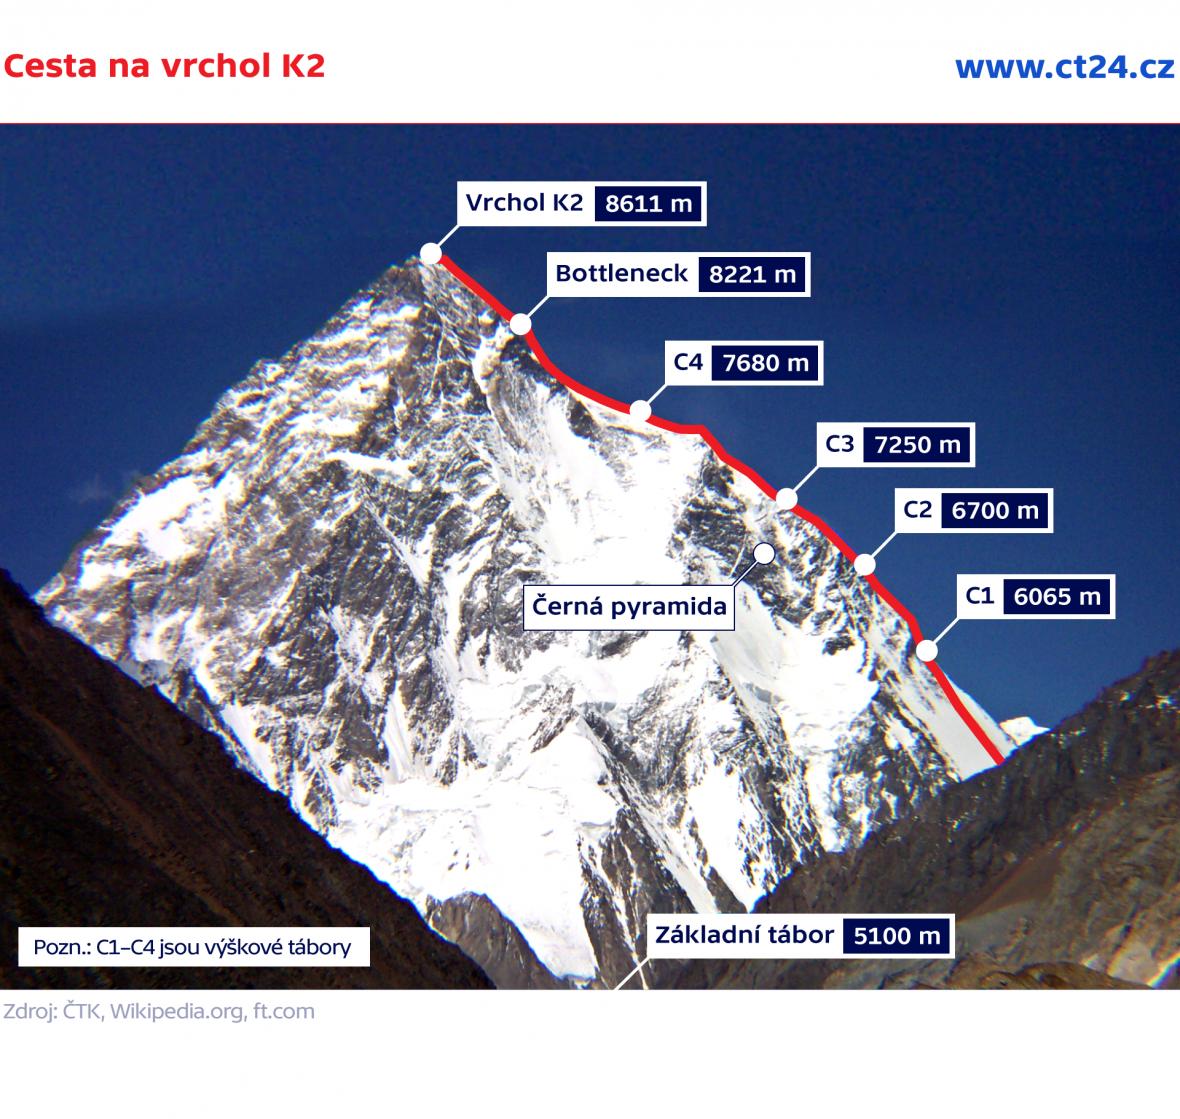 Cesta na vrchol K2